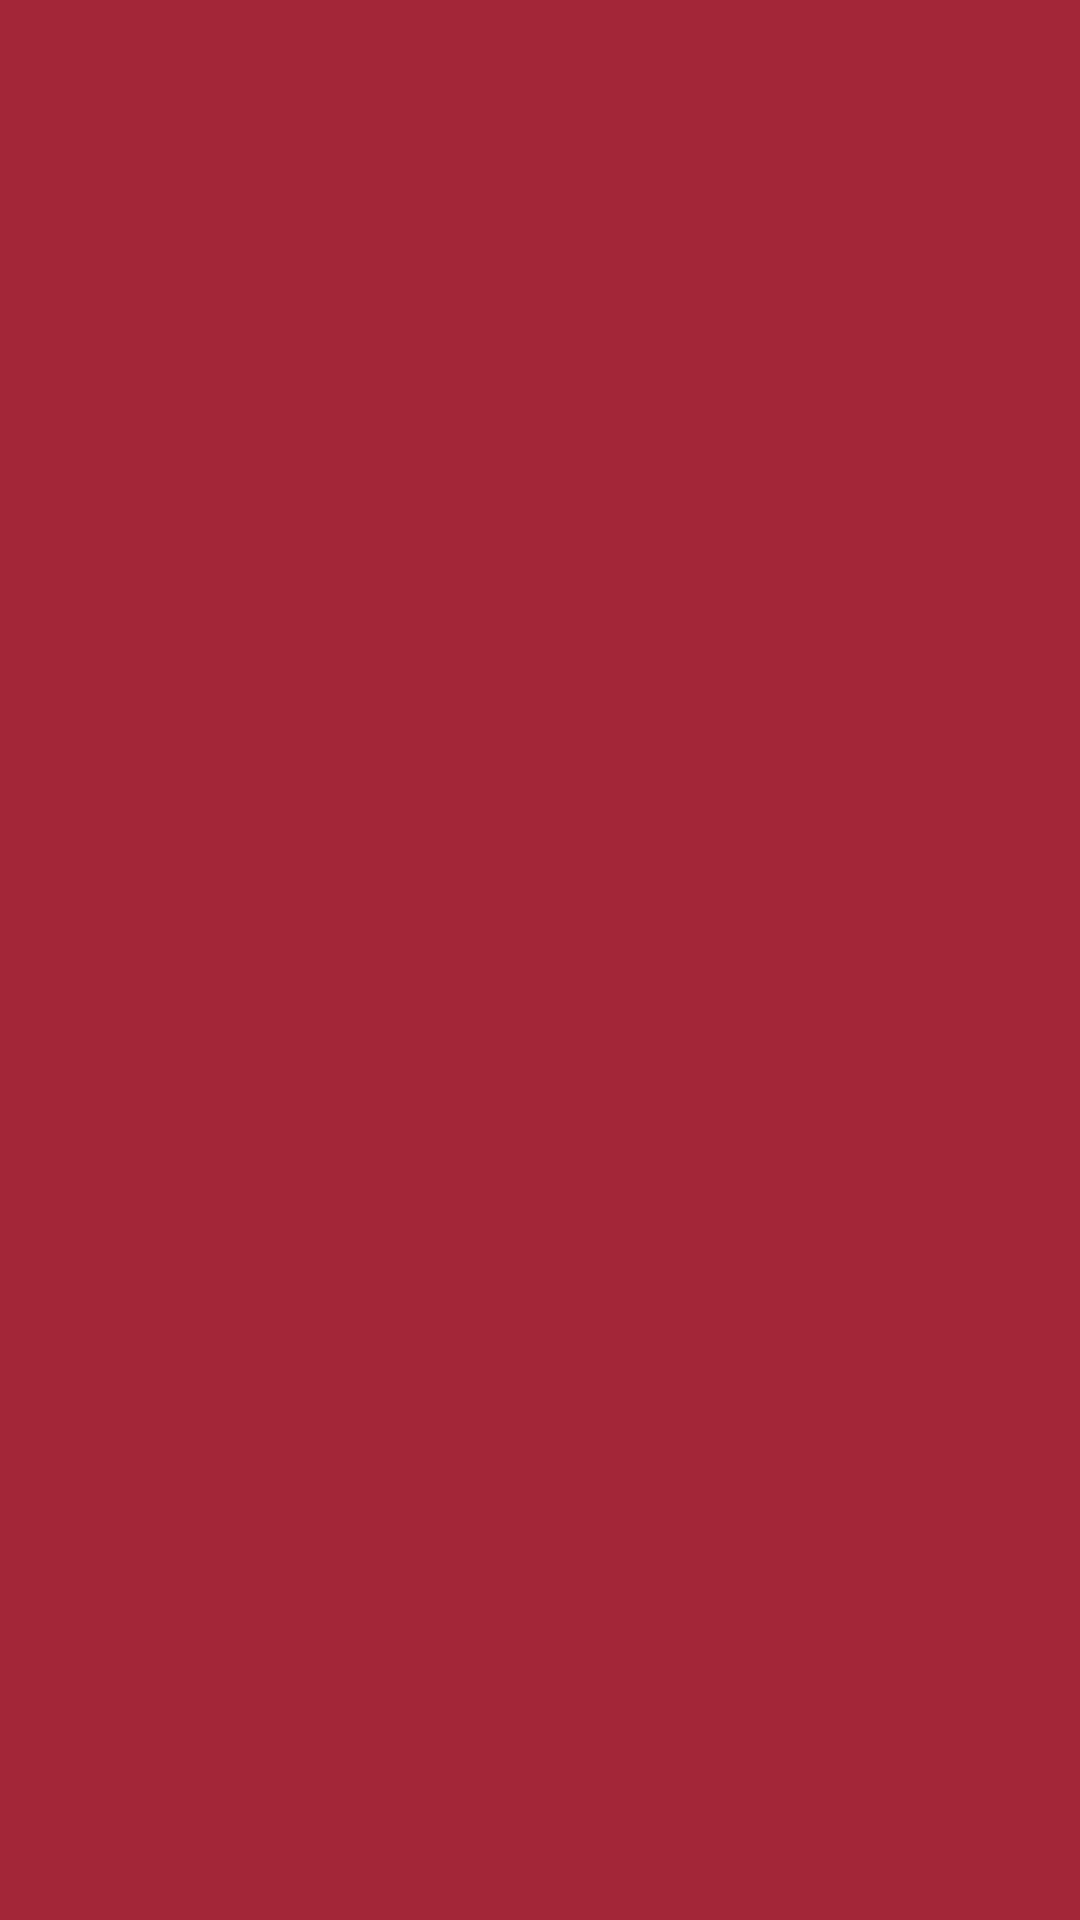 1080x1920 Alabama Crimson Solid Color Background